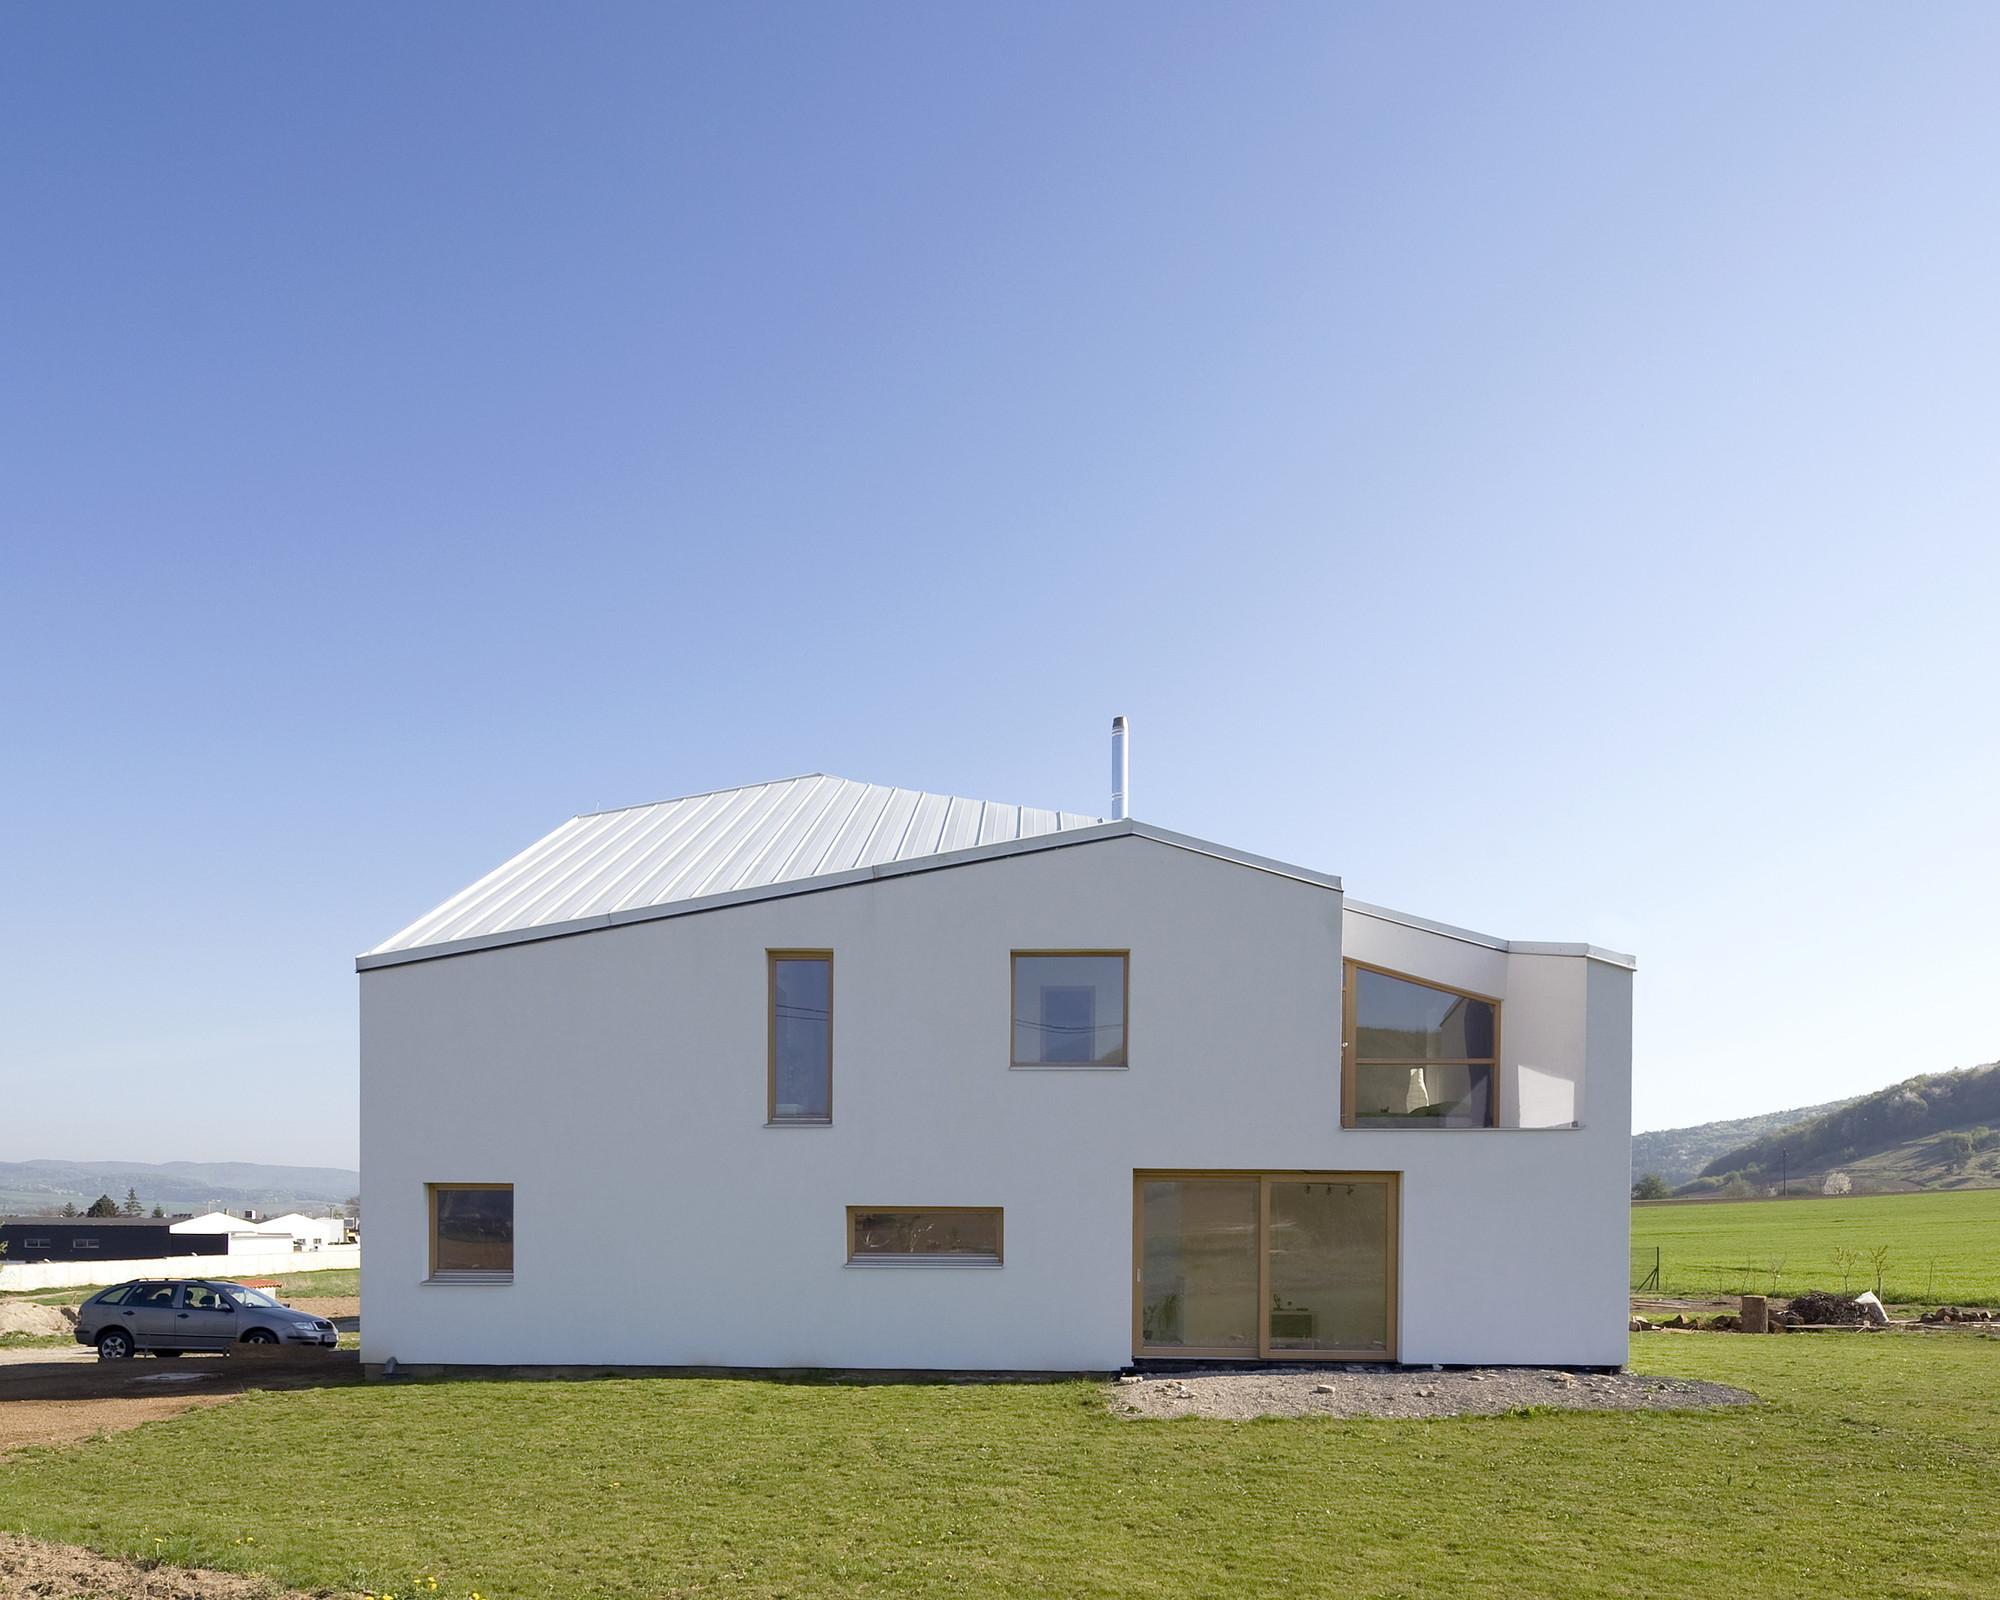 House in Opatova / P-U-R-A, Courtesy of Aparat